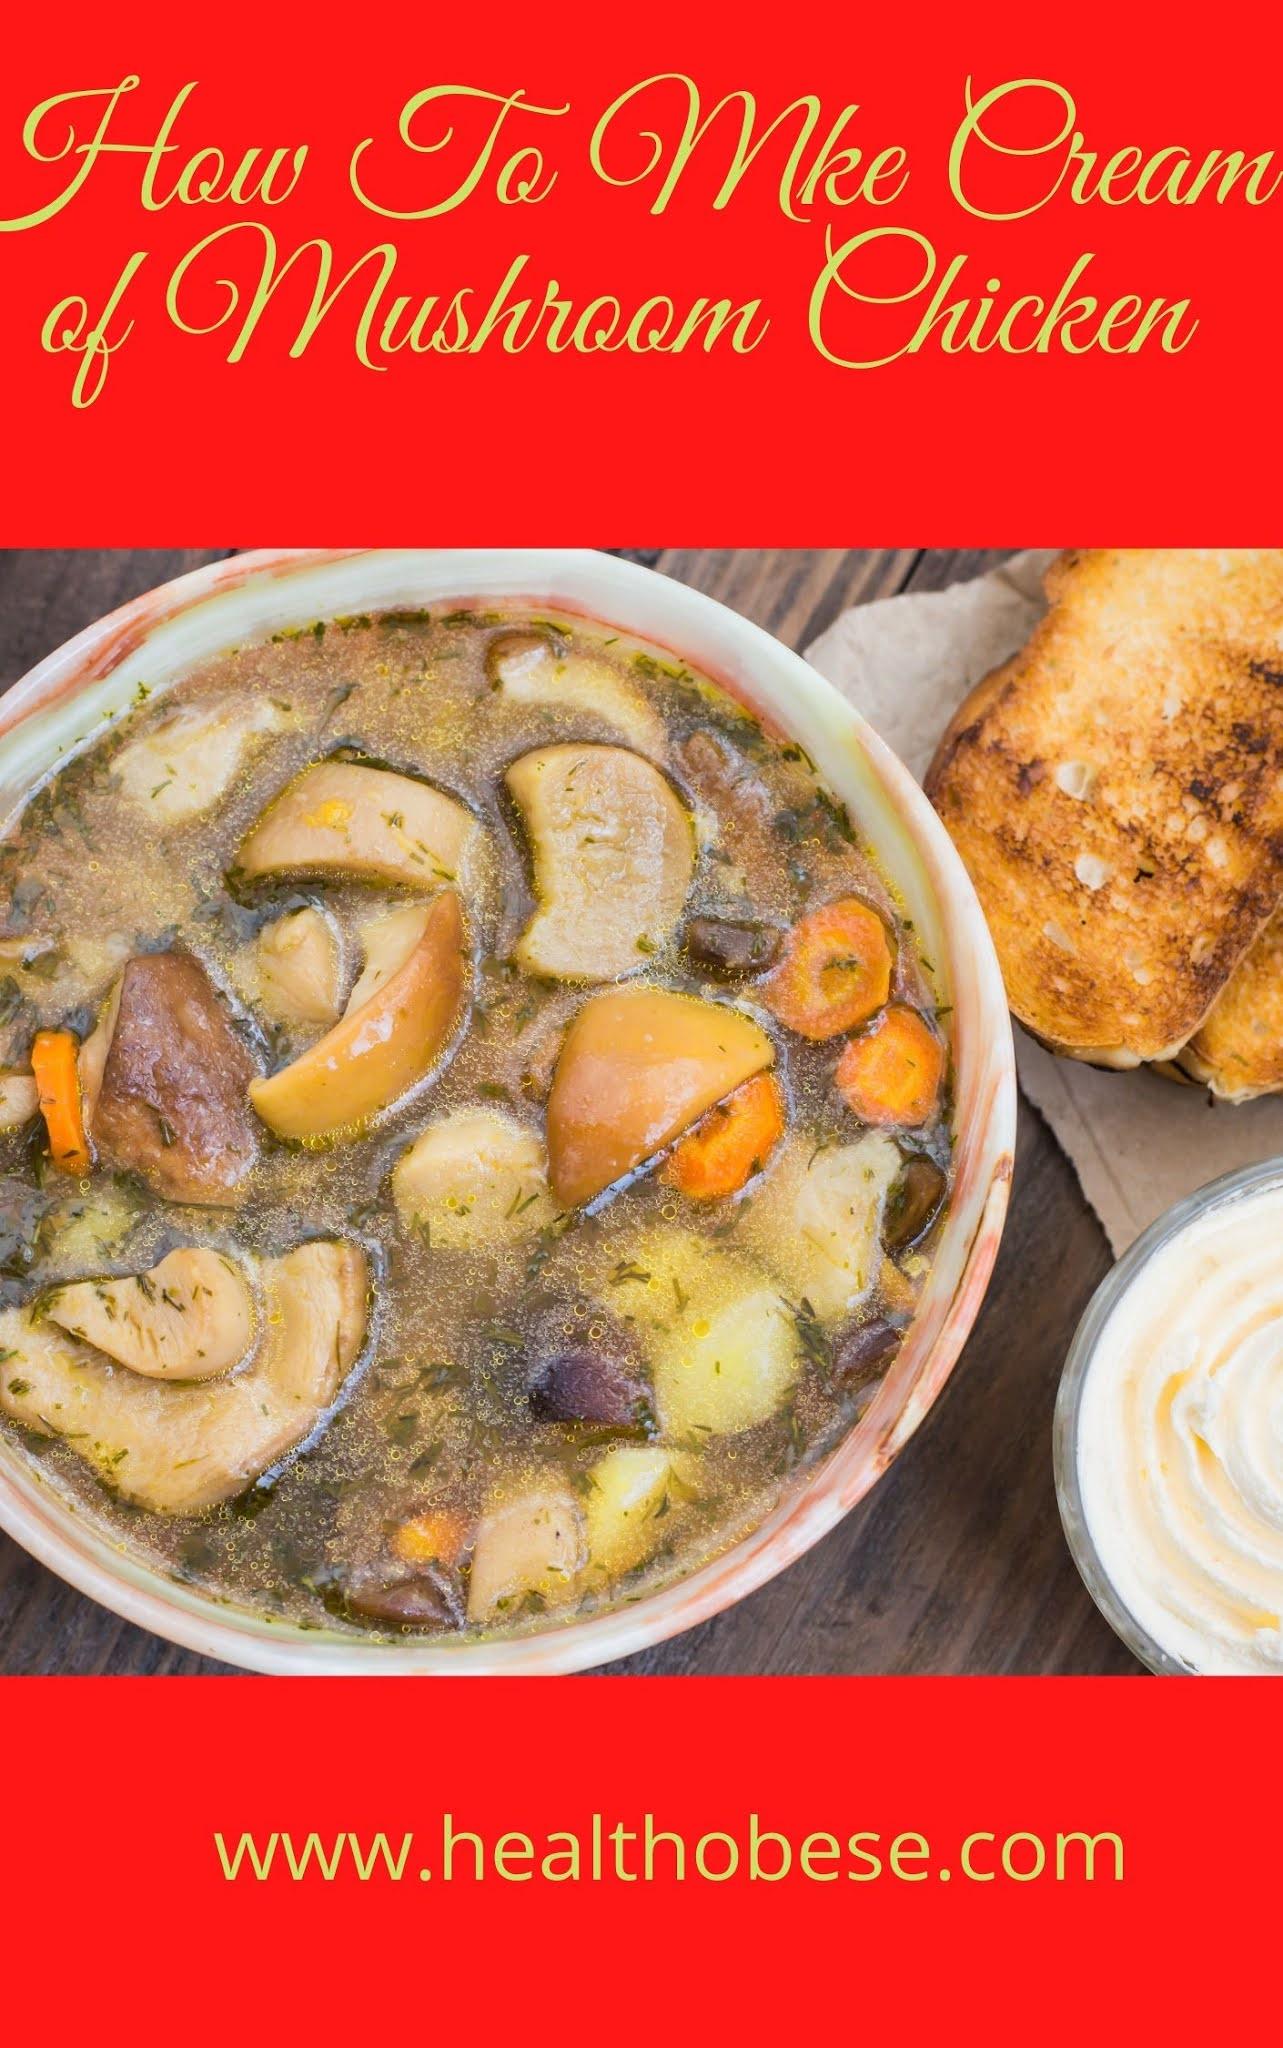 How To Mke Cream of Mushroom Chicken